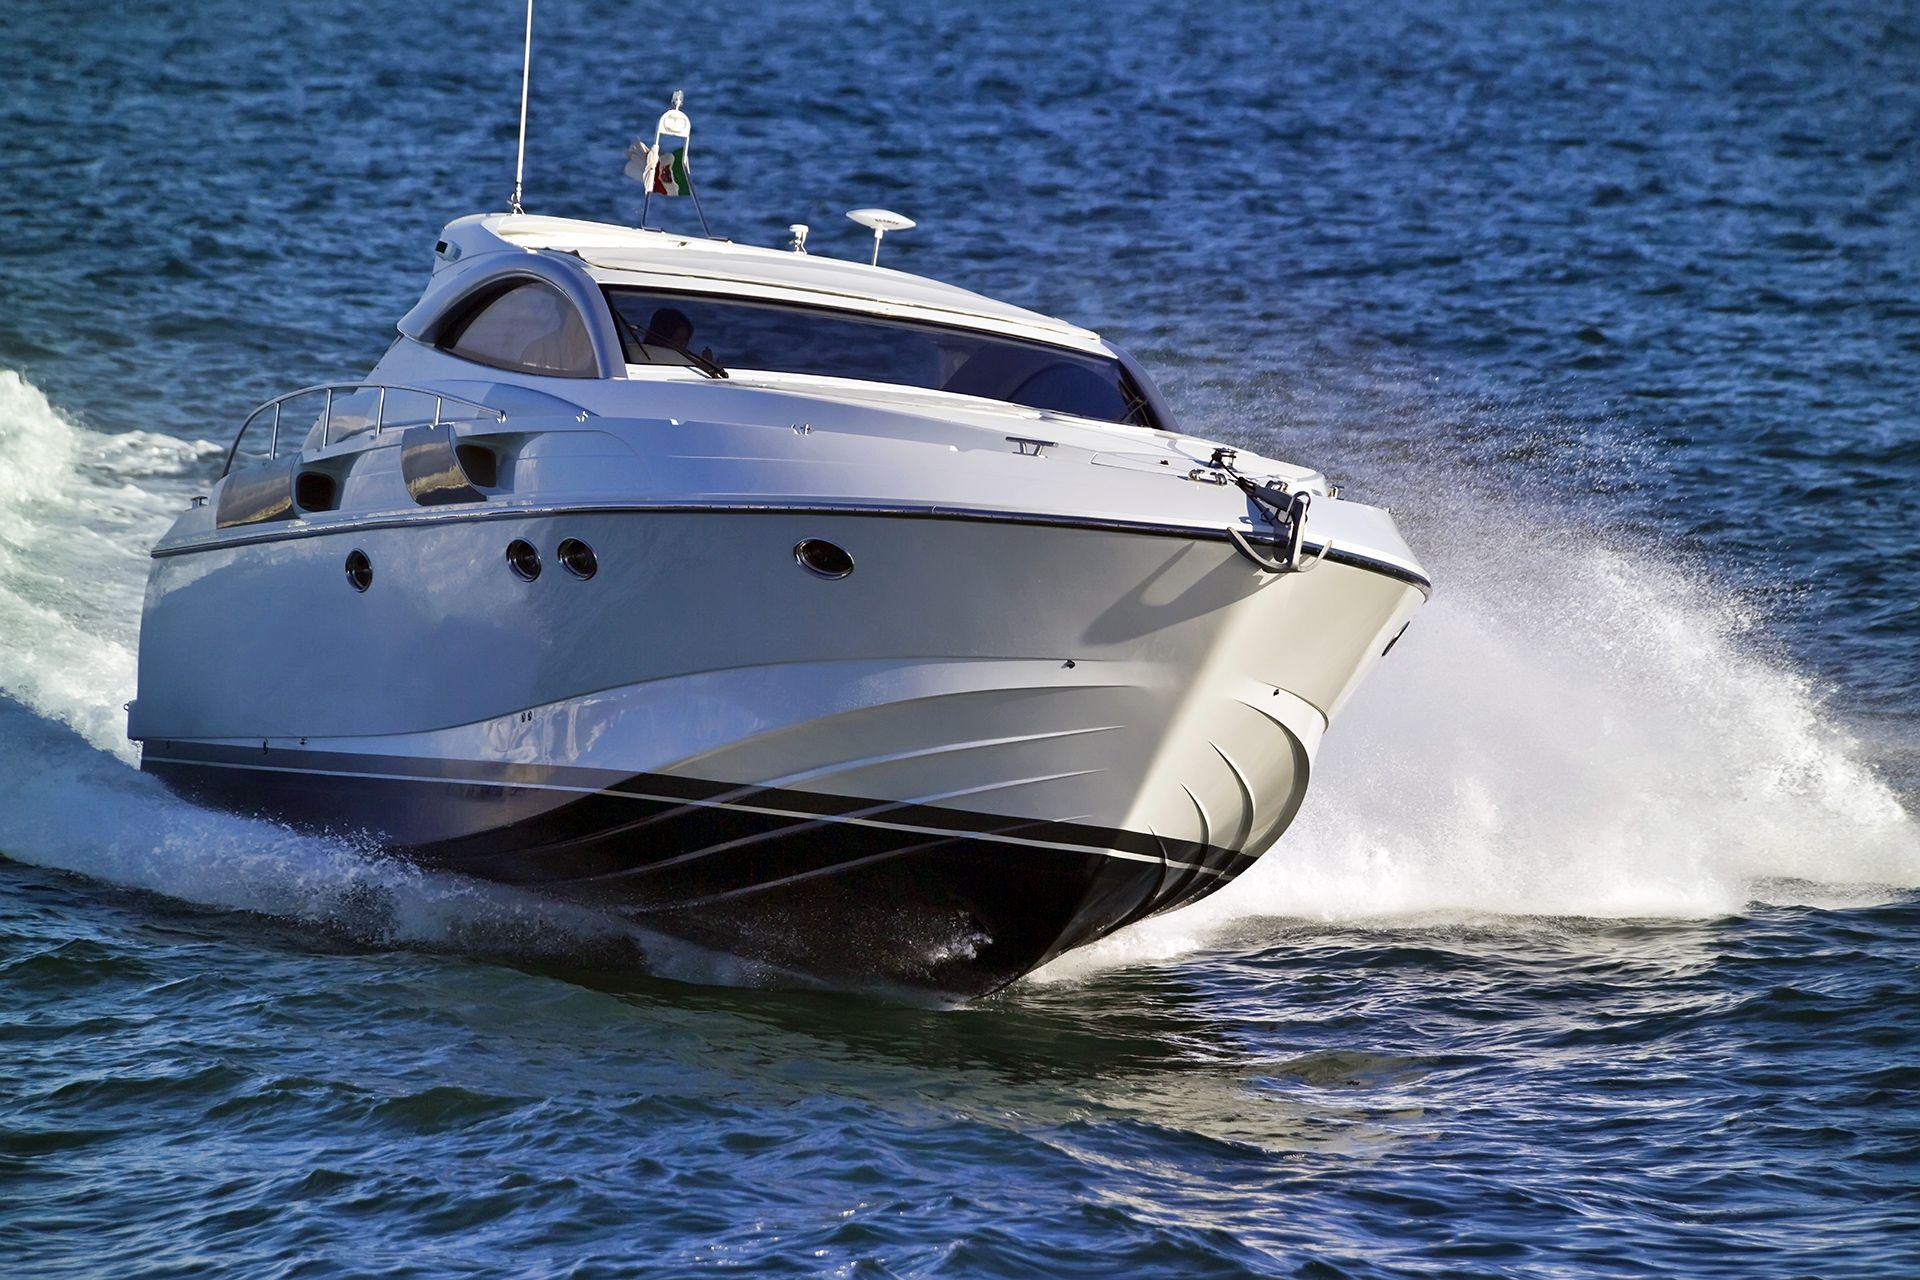 motorboot la cura dello yacht. Black Bedroom Furniture Sets. Home Design Ideas